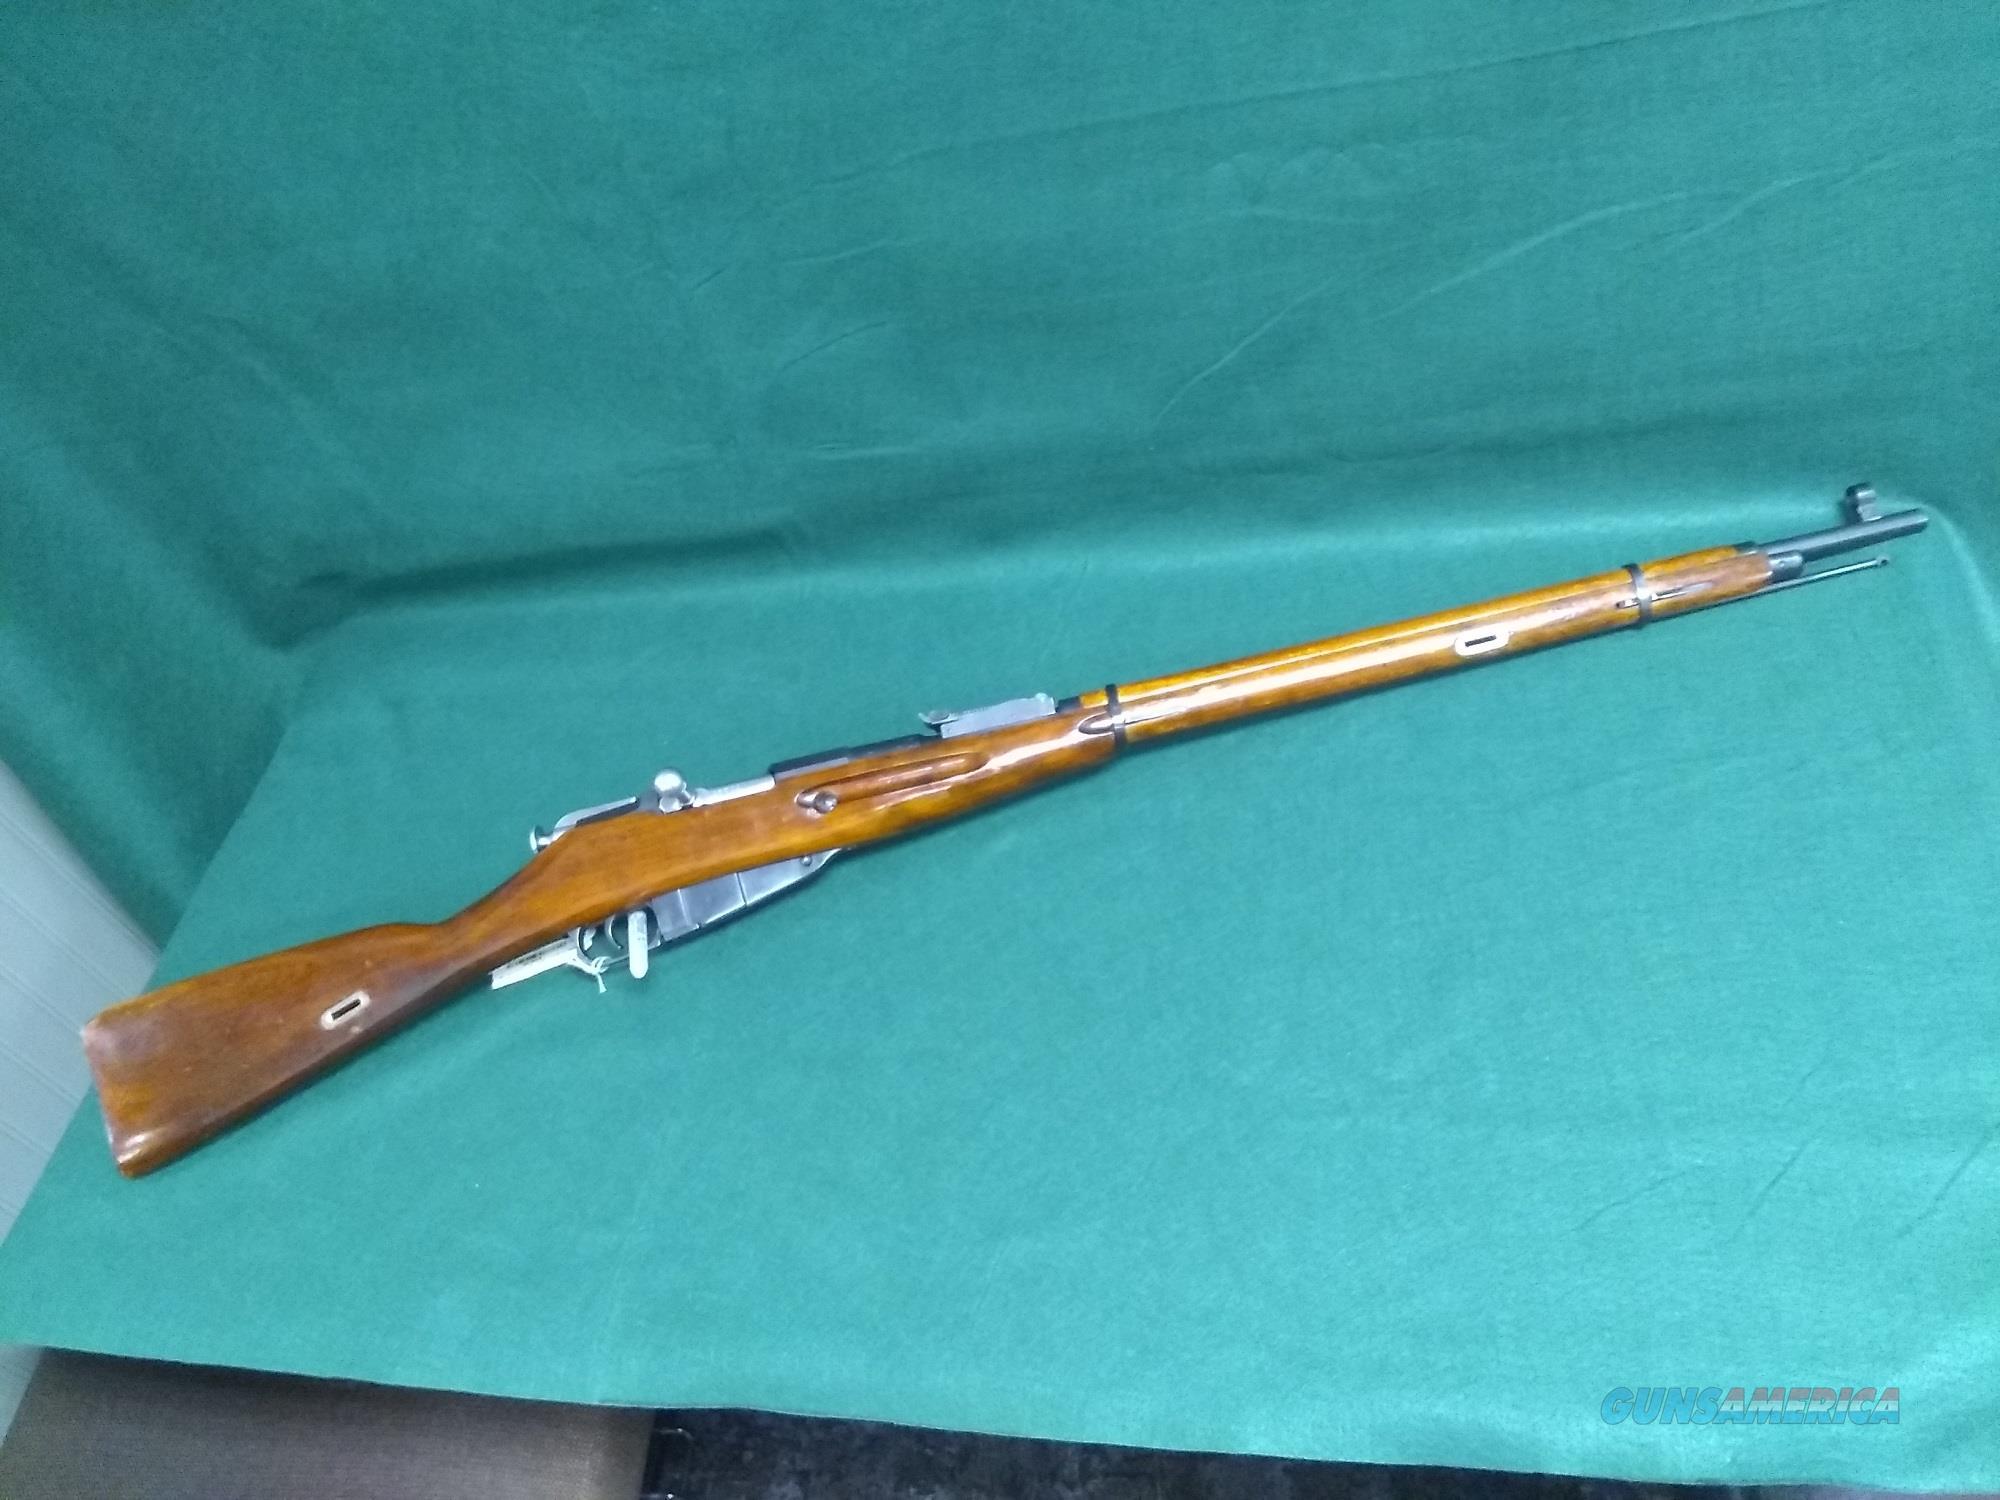 1931r Mosin Nagant 9130 7.62X54R - Izhevsk Plant - Hex Receiver   Guns > Rifles > Mosin-Nagant Rifles/Carbines